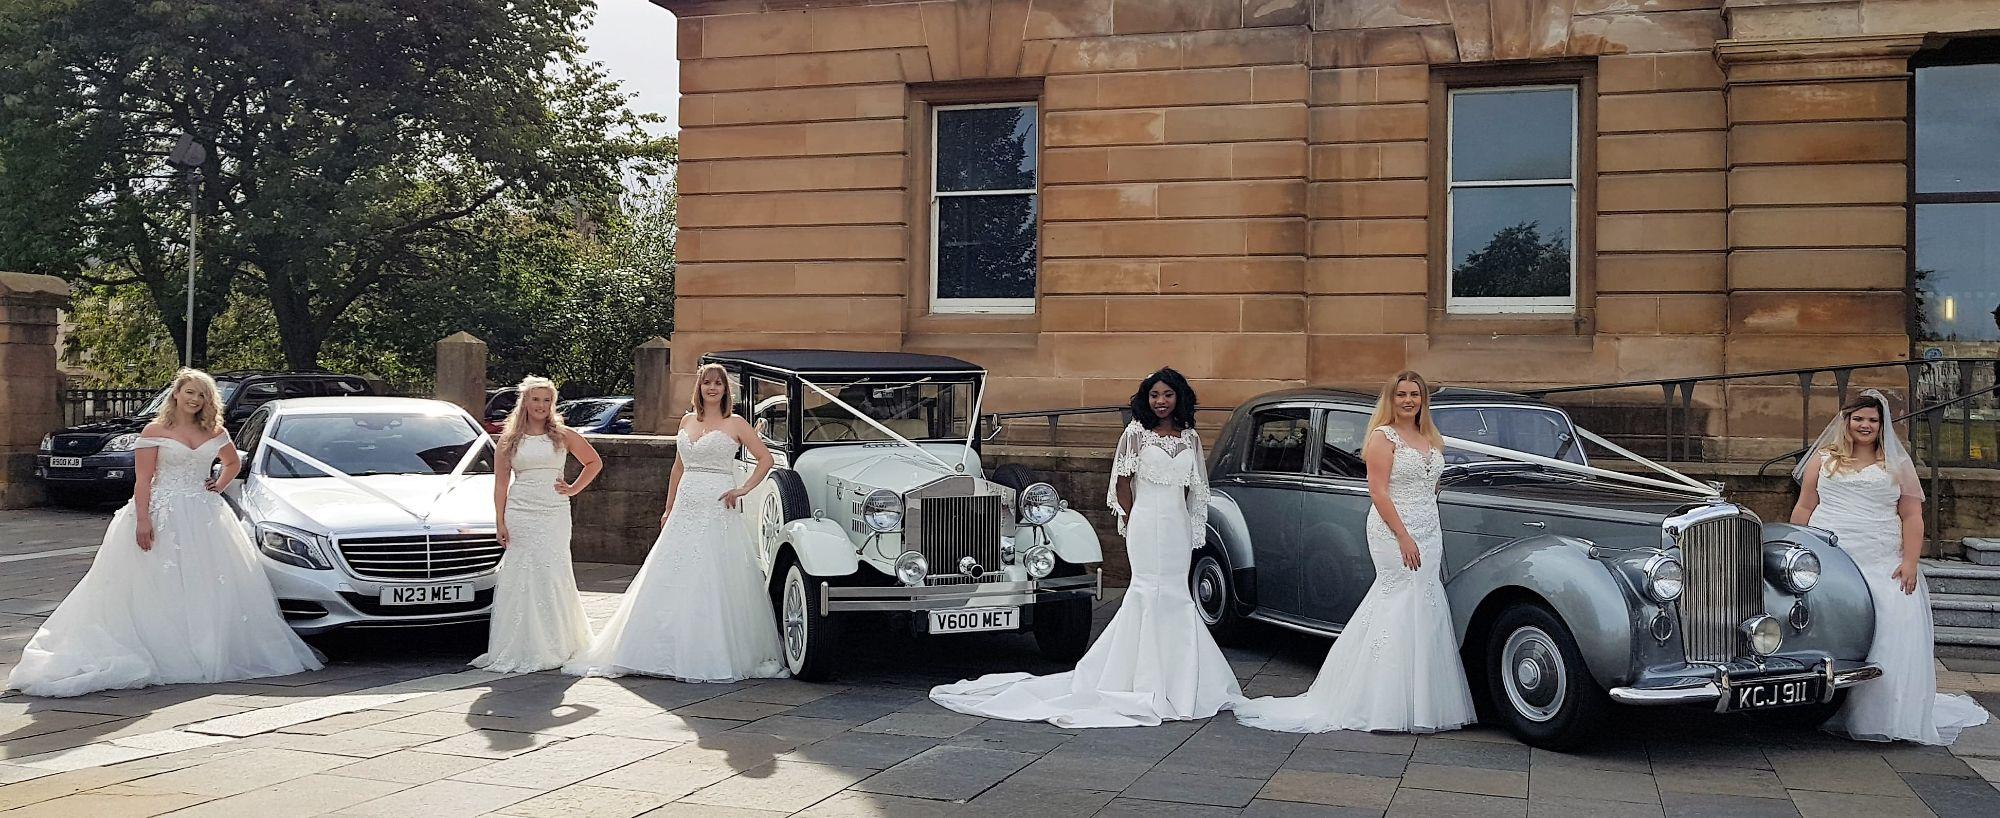 Paisley Town Hall Wedding Fayre 160918 (3).jpg